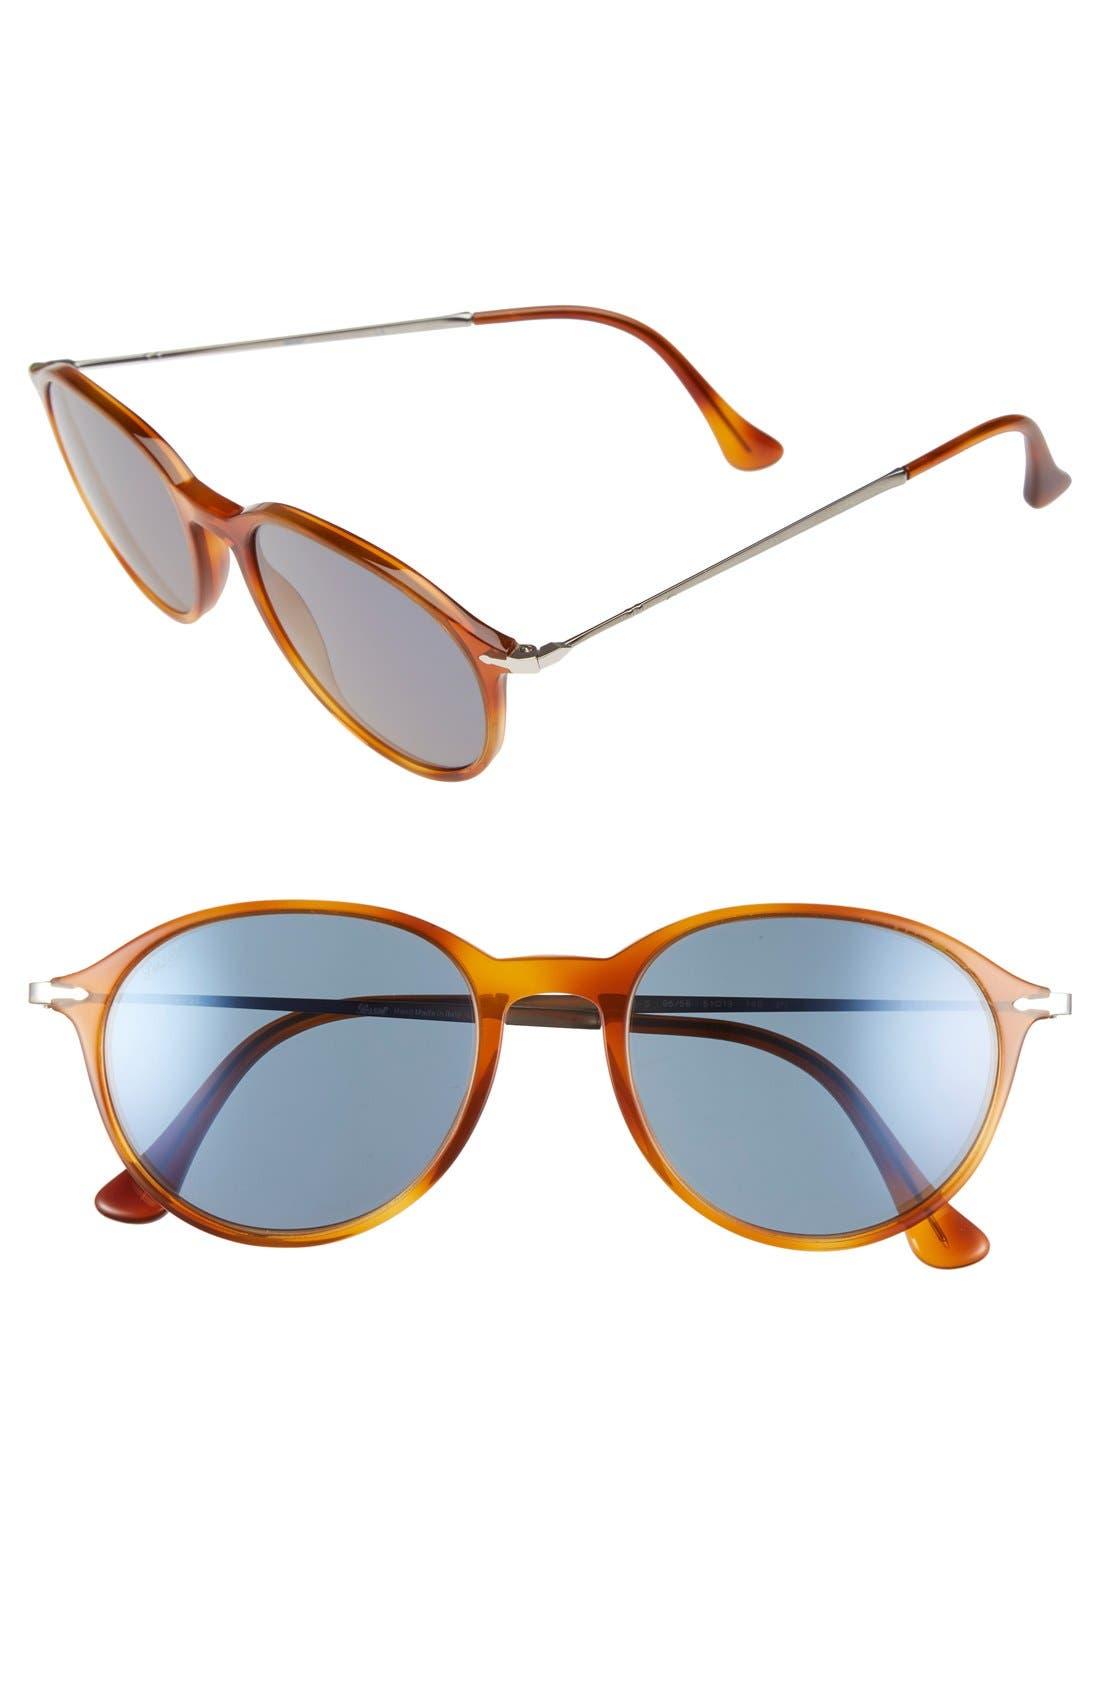 Persol 51mm Sunglasses